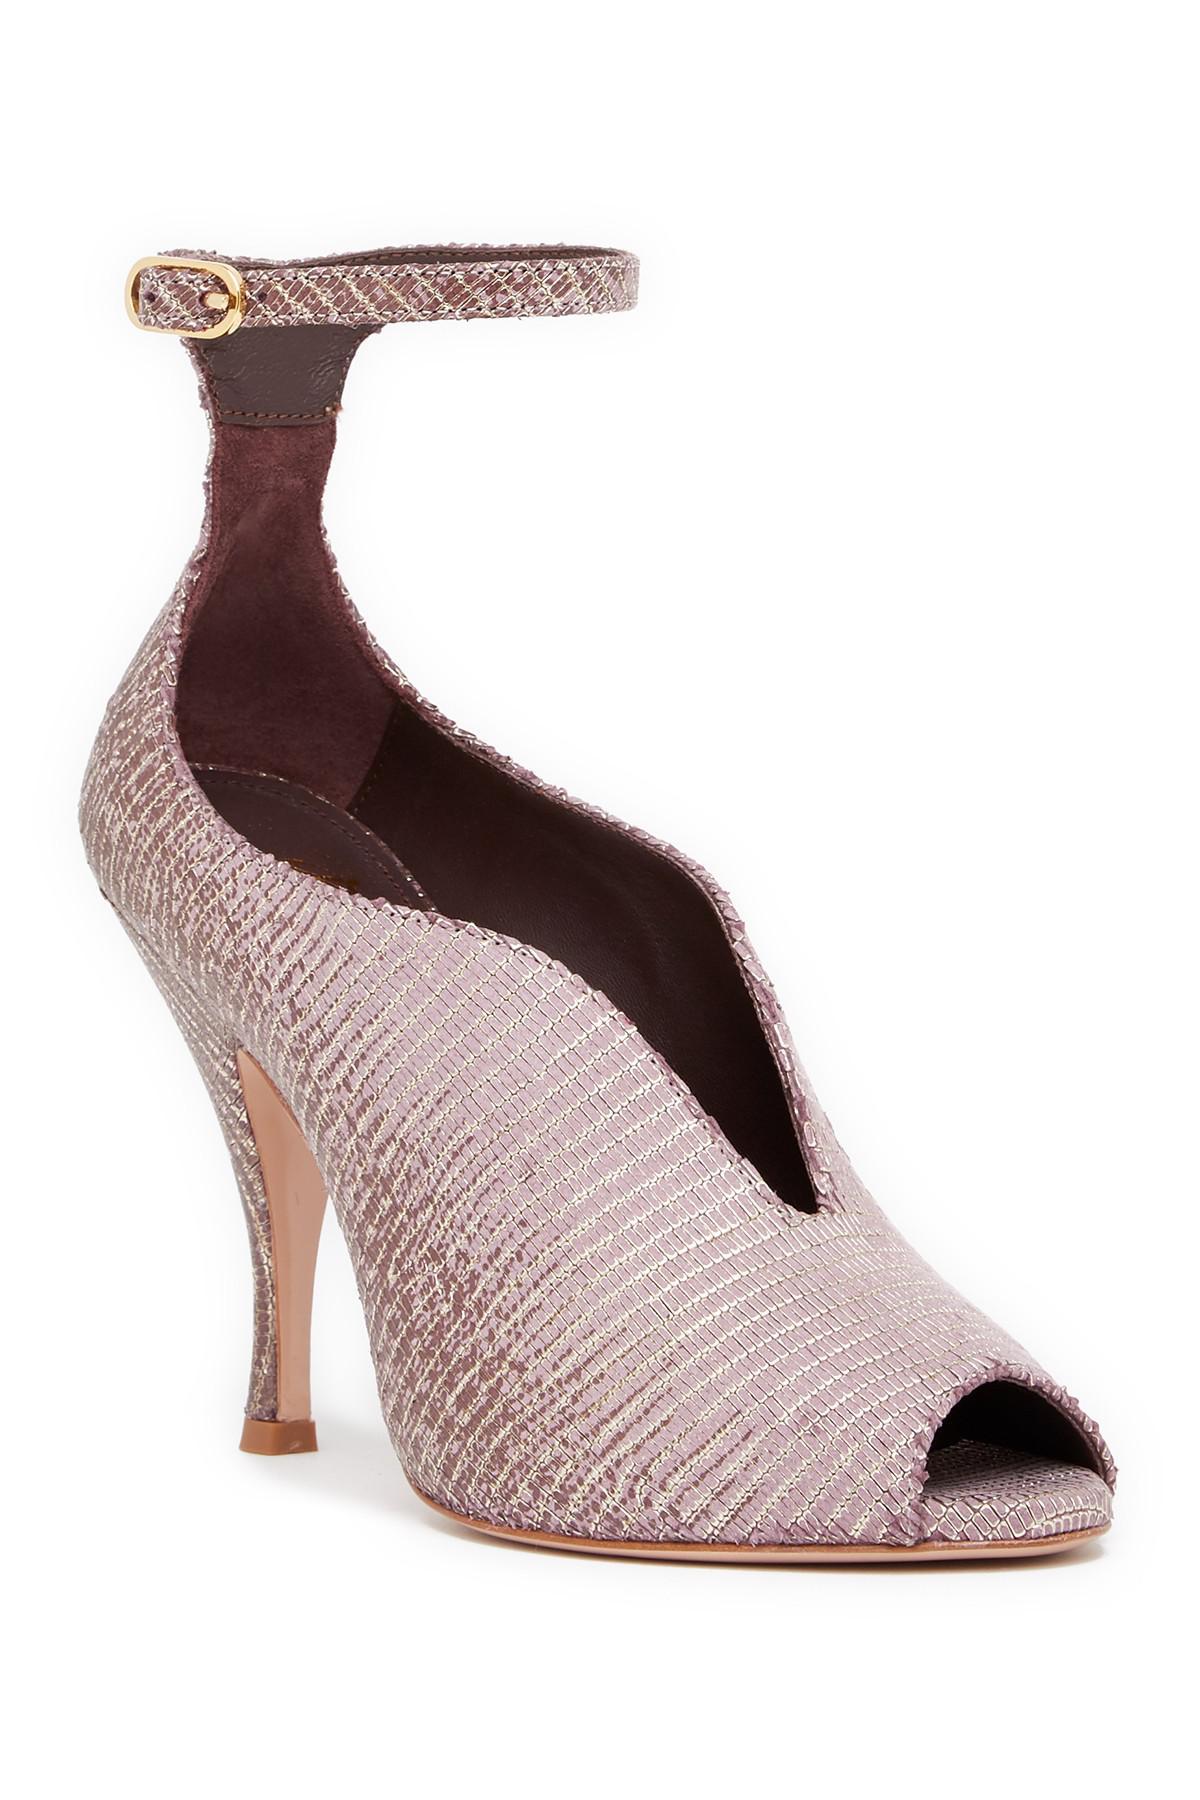 Bruno Magli Cali Peep Toe Ankle Strap Pump xk3S9cOP